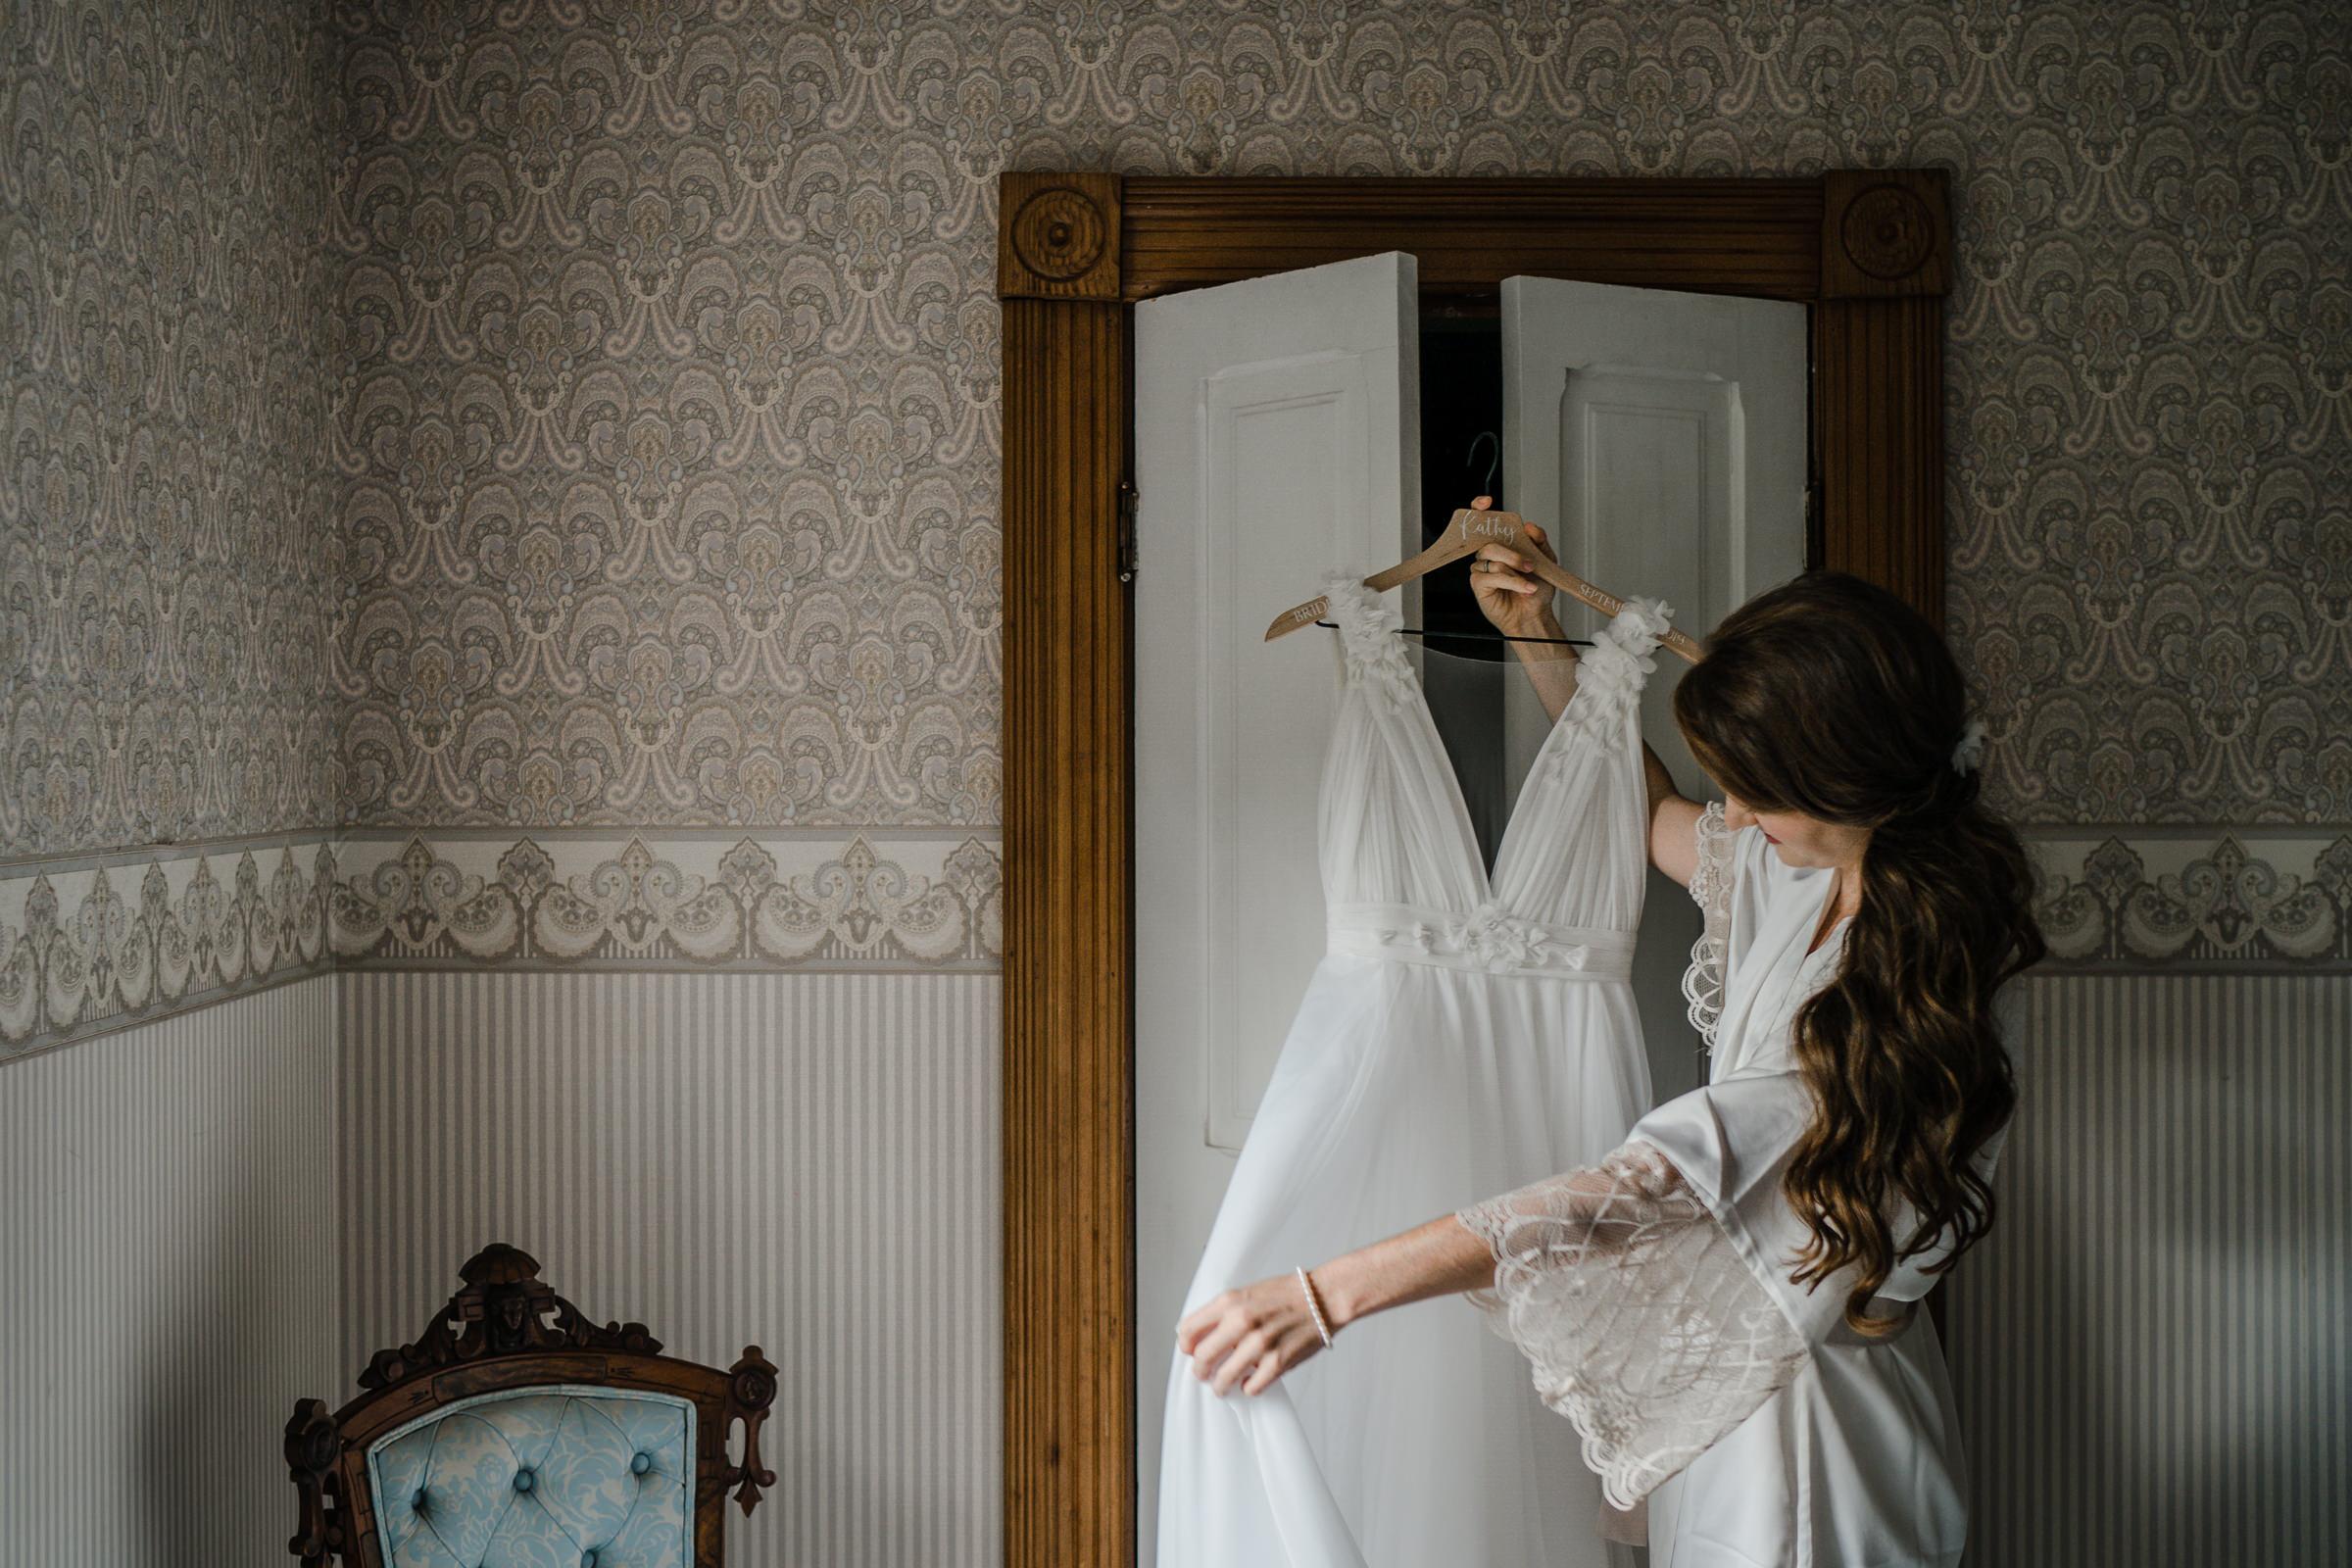 Bride admires gown on hangar - photo by Sasha Reiko Photography